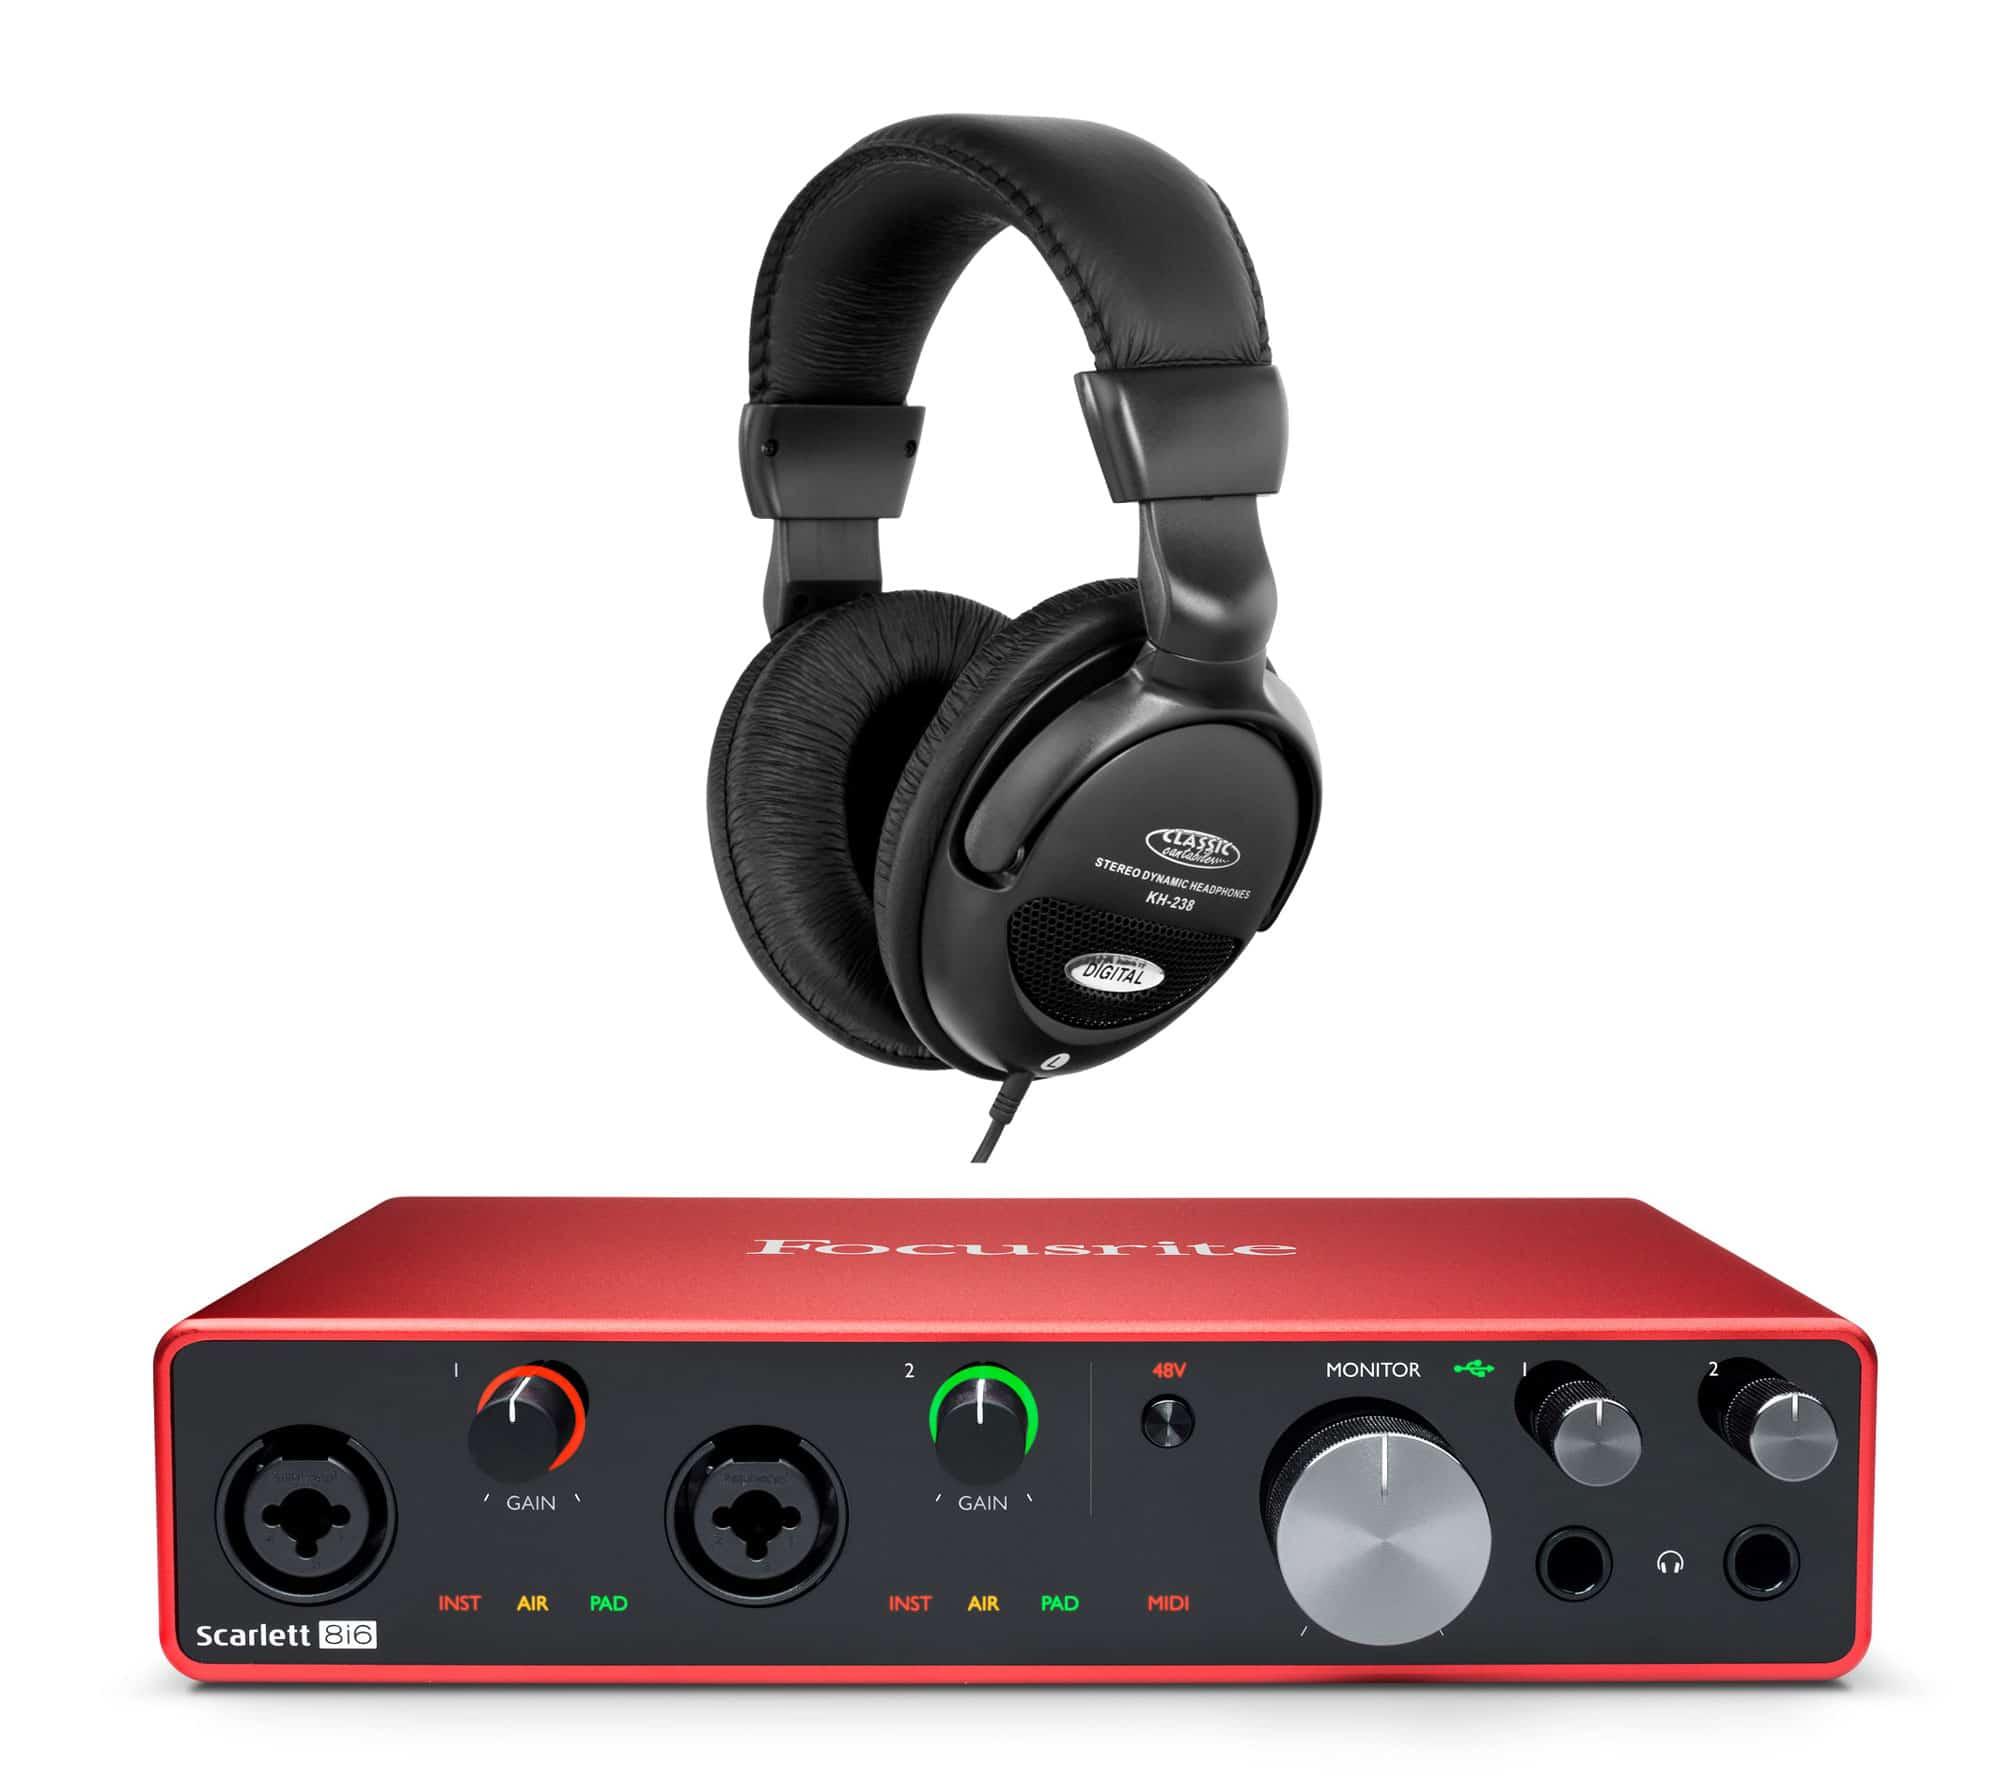 Pchardware - Focusrite Scarlett 8i6 USB Audio Interface Set - Onlineshop Musikhaus Kirstein